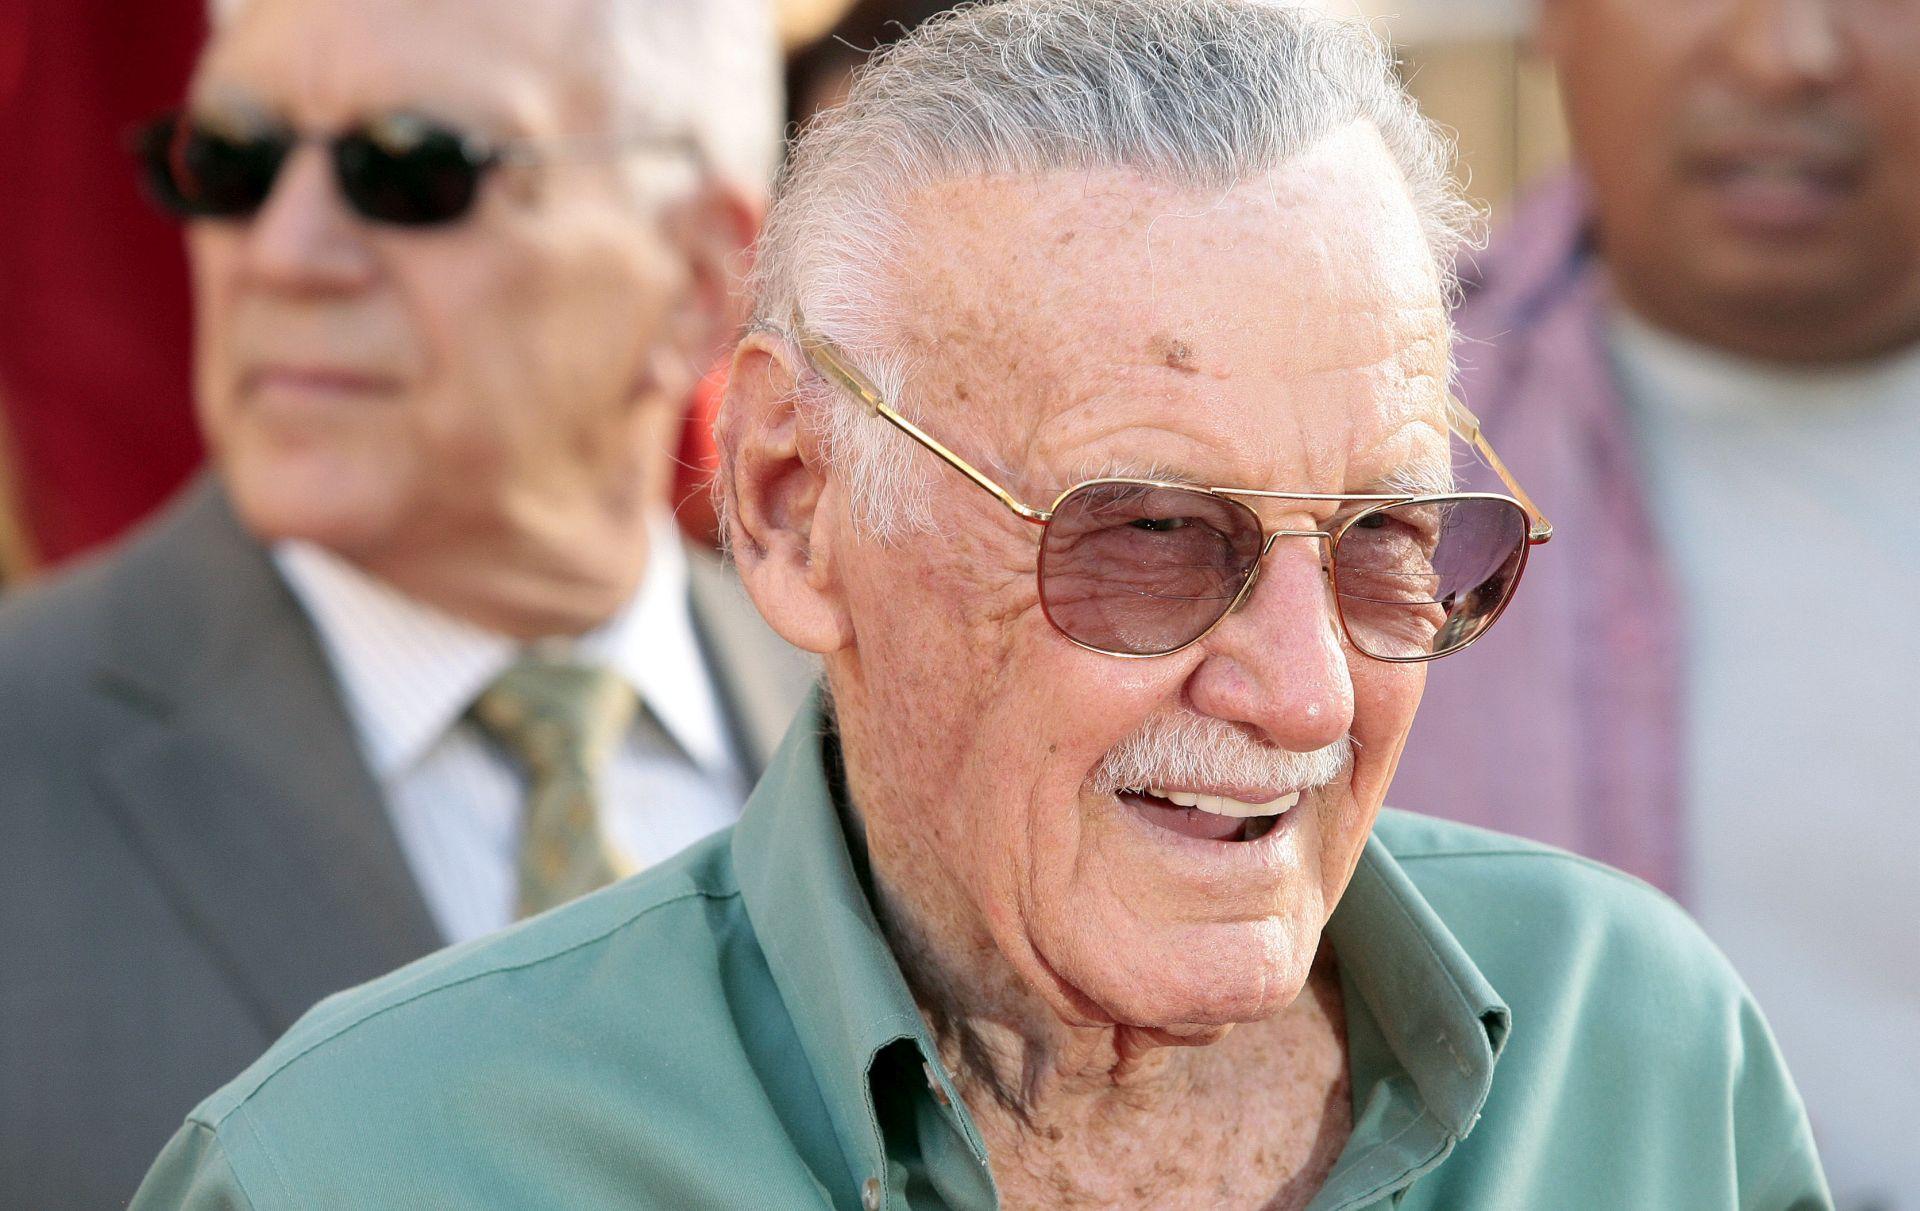 Umro legendarni Stan Lee, kreator Spidermana i Hulka